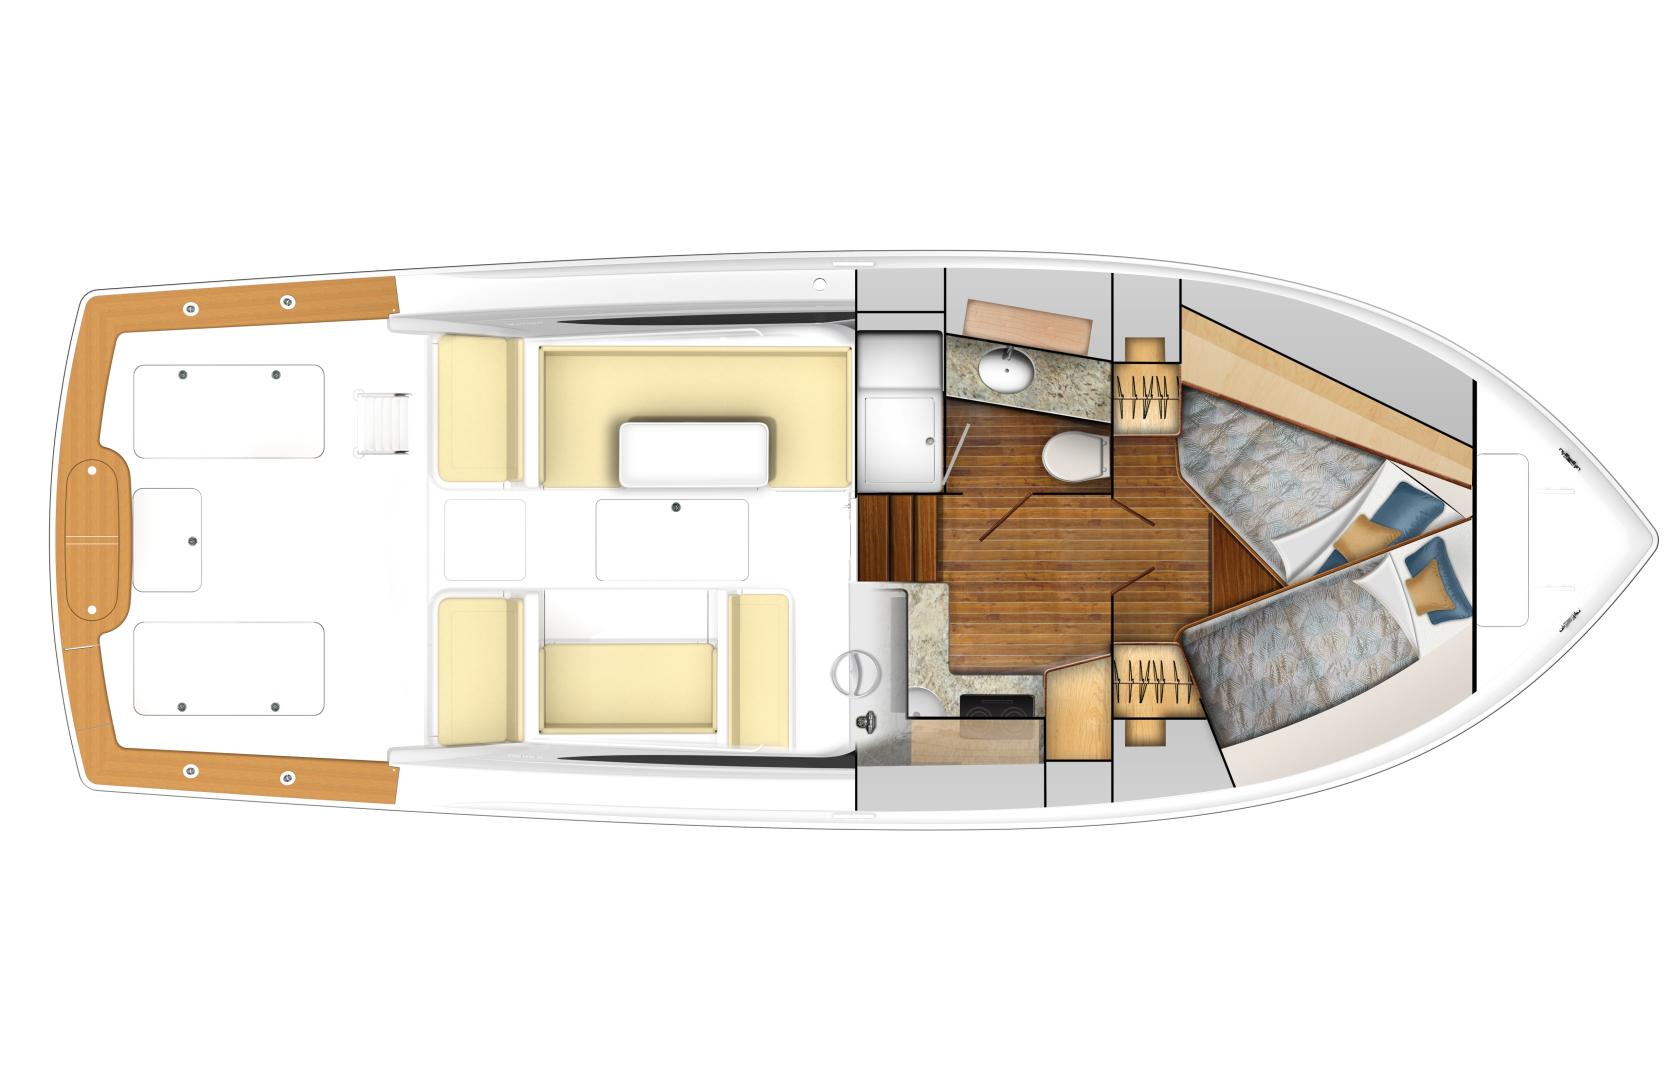 Viking 38 - Option #2 Deck/Cabin Layout